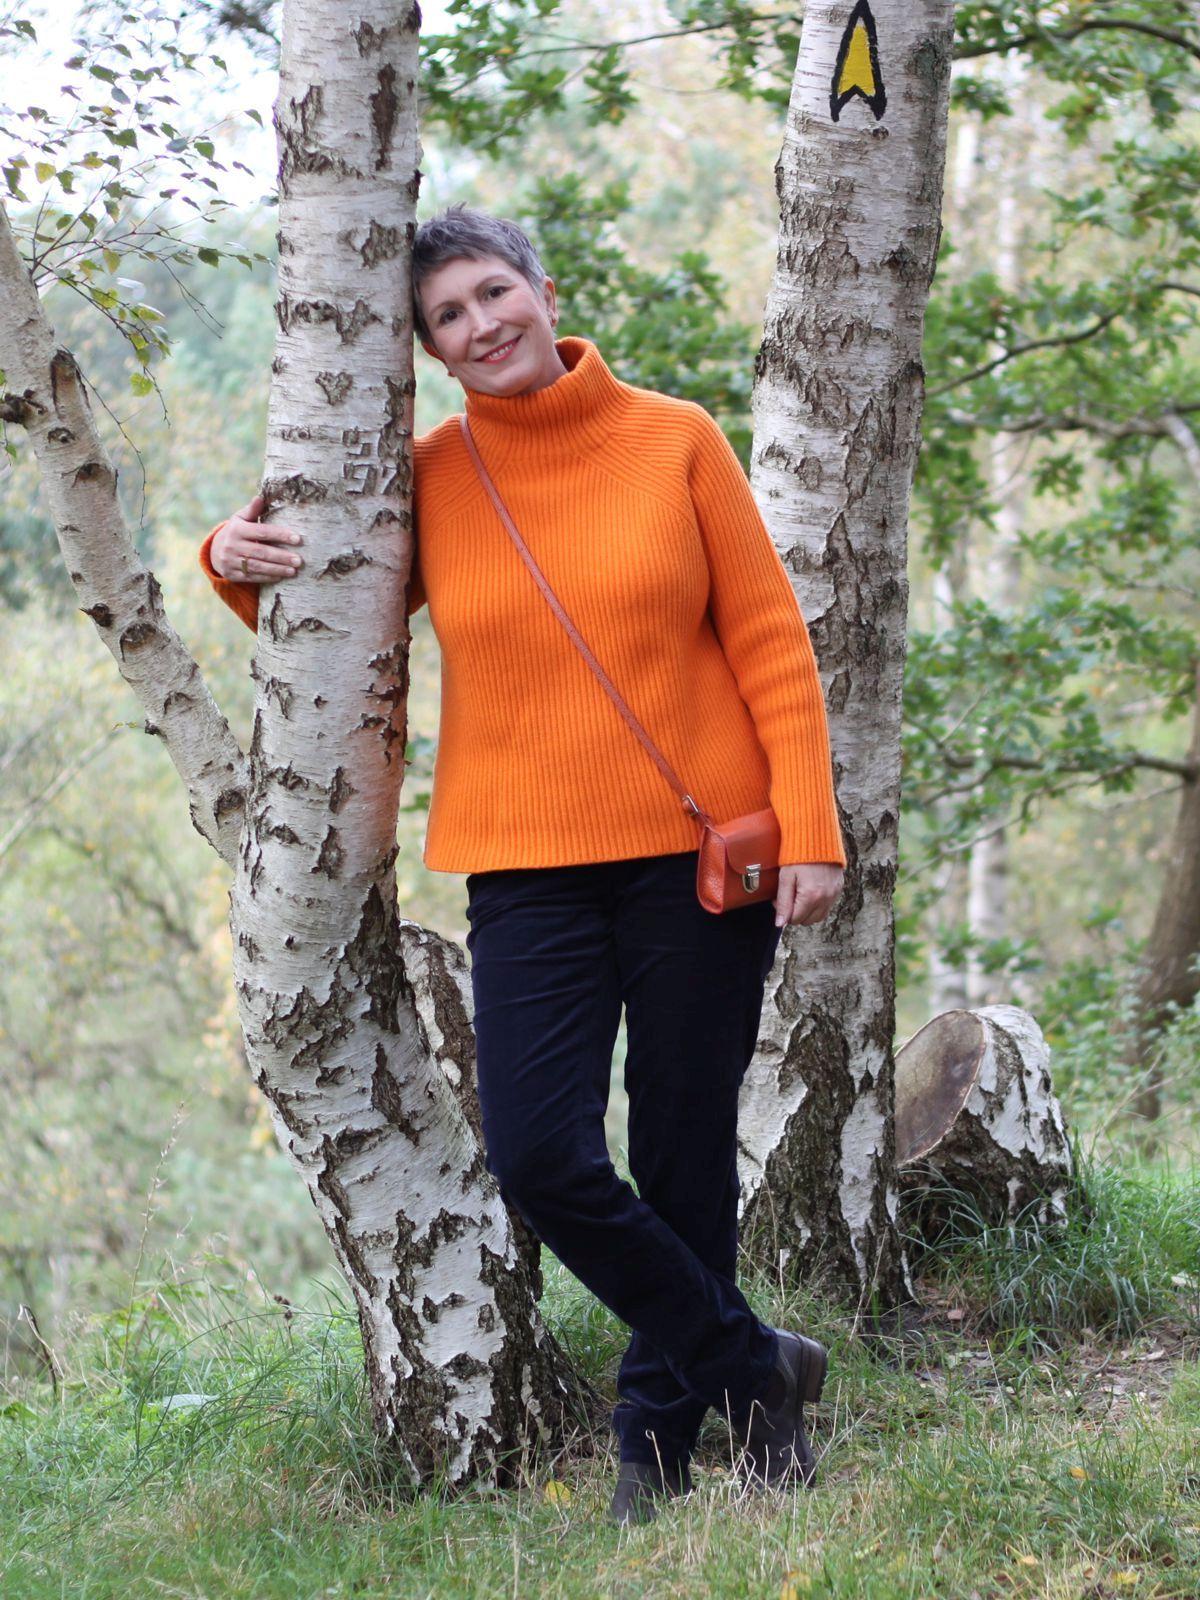 Ines Meyrose – Outfit 2021 – Rollkragenpullover / Turtleneck orange, Cordhose blau - Ü50 Bloggerin